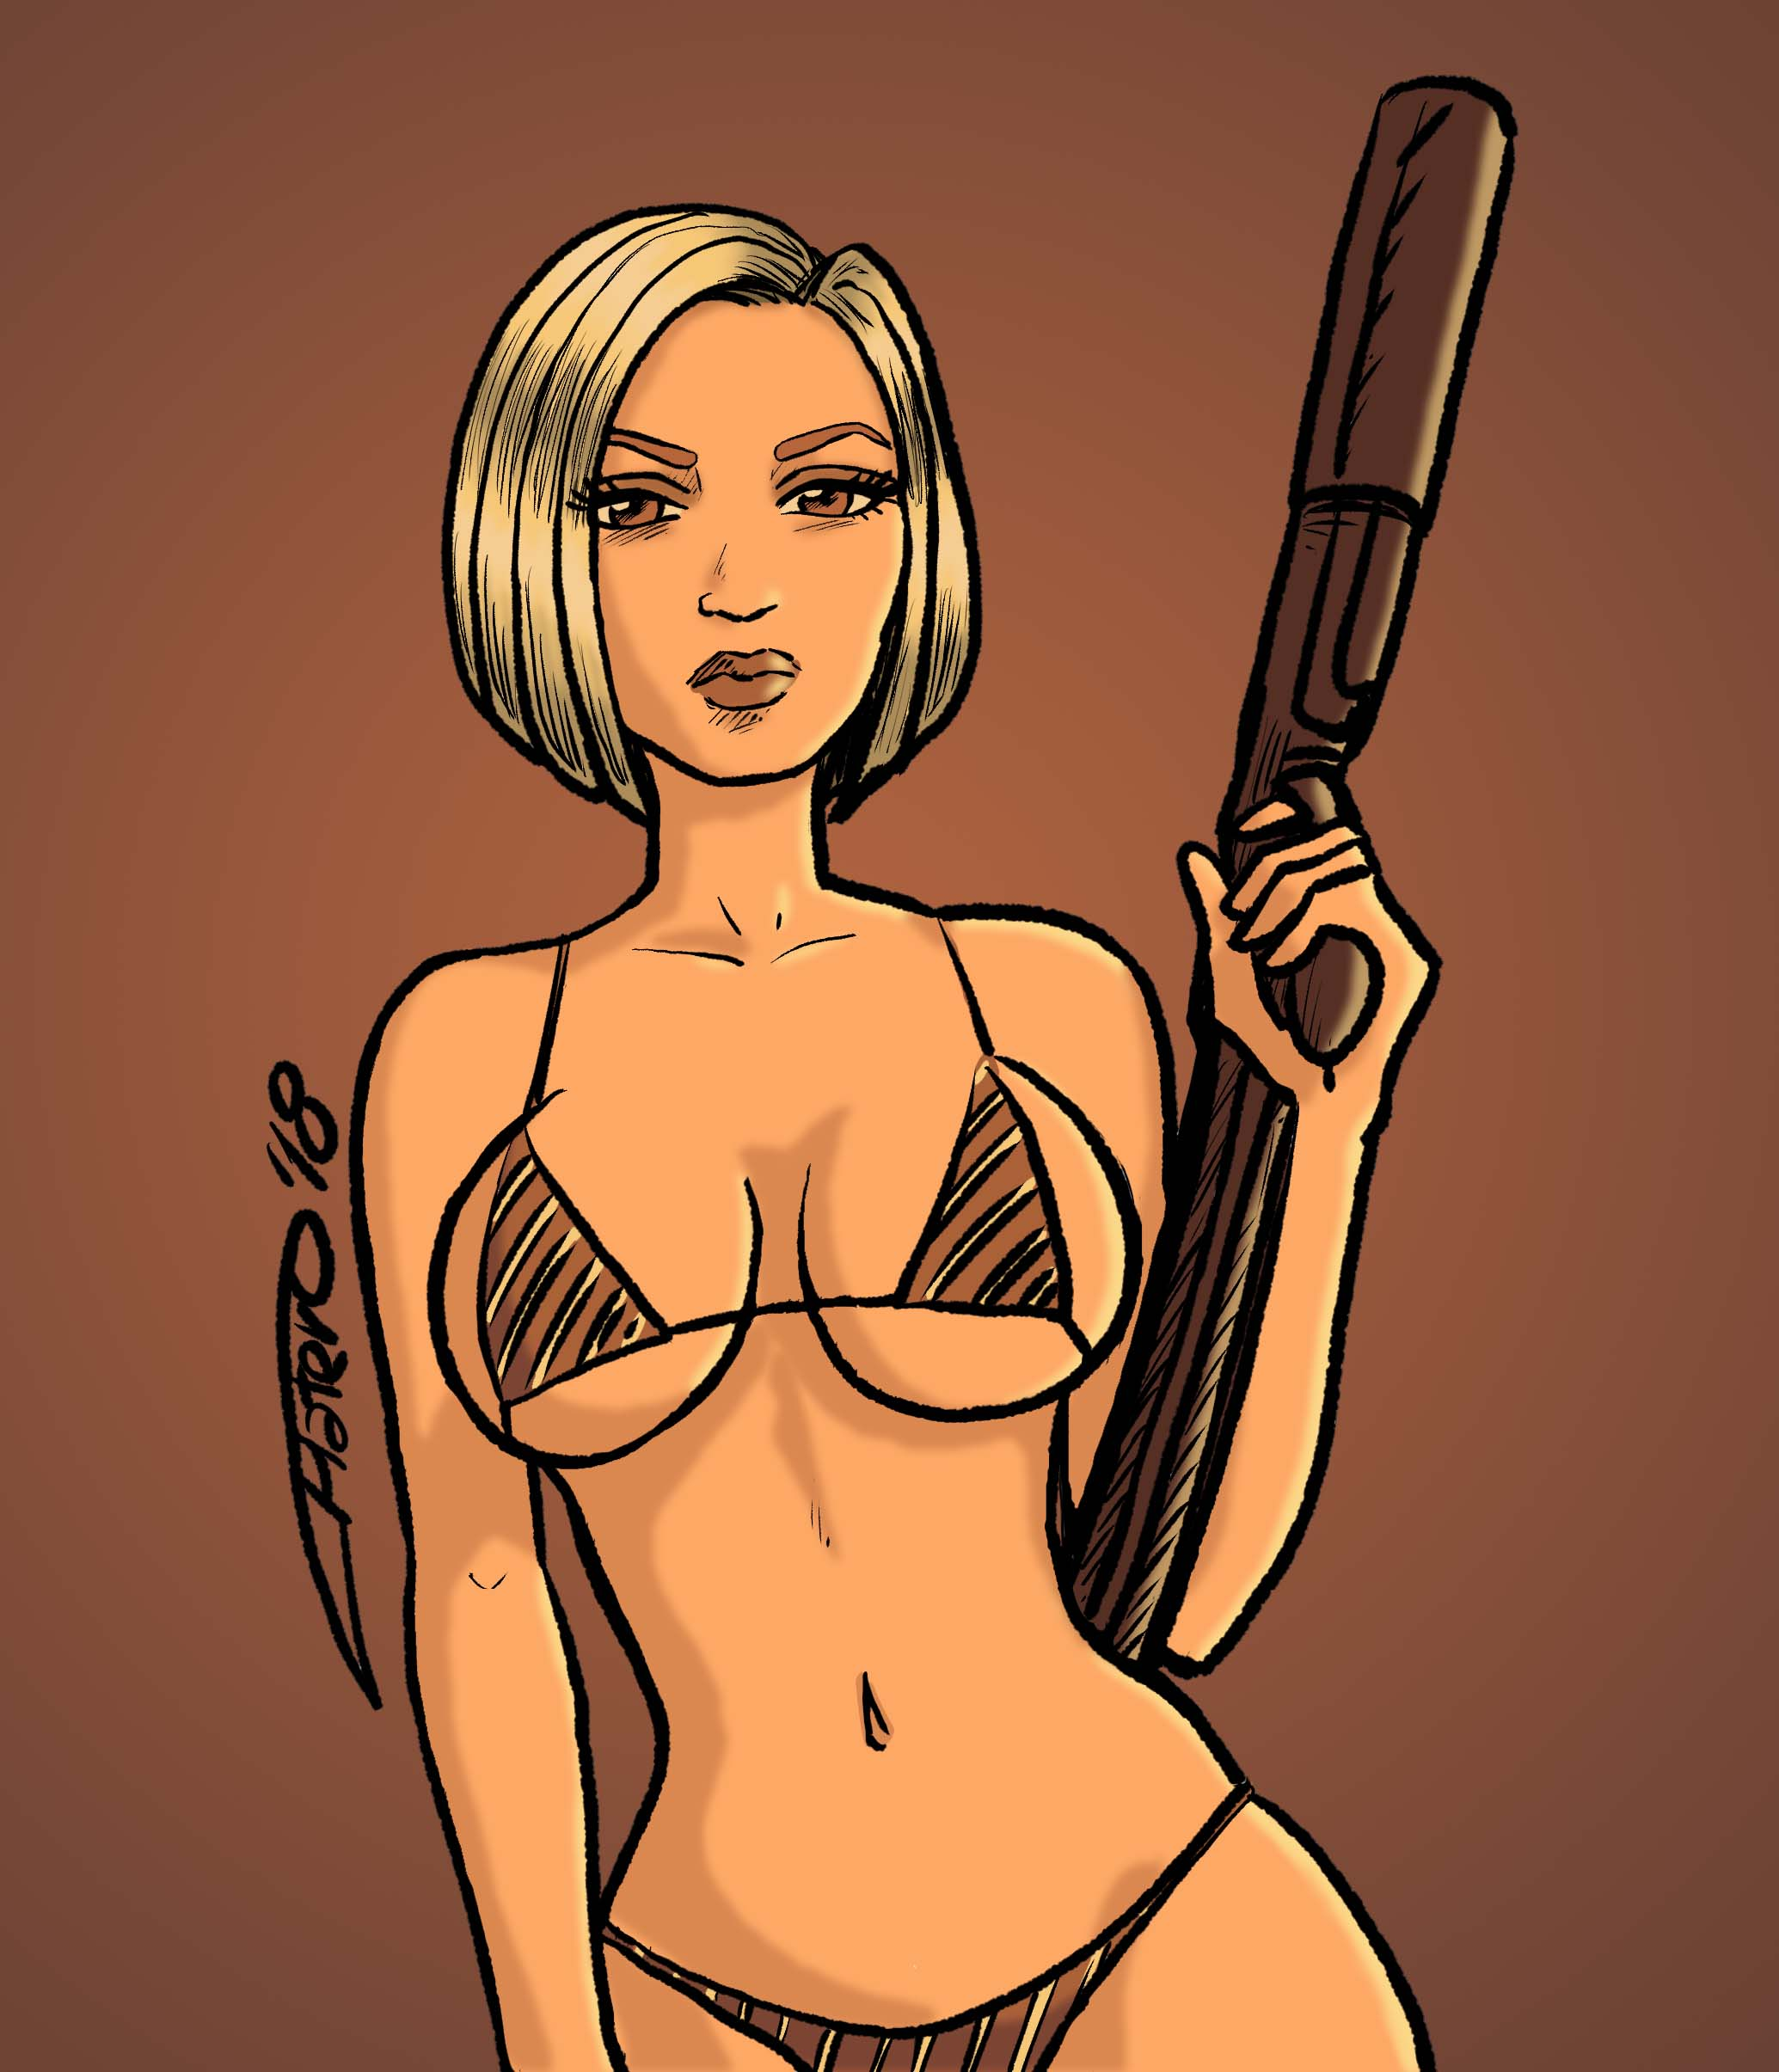 color_chica_jose_luis_platero_dibujo_lapiz_sketch_bikini